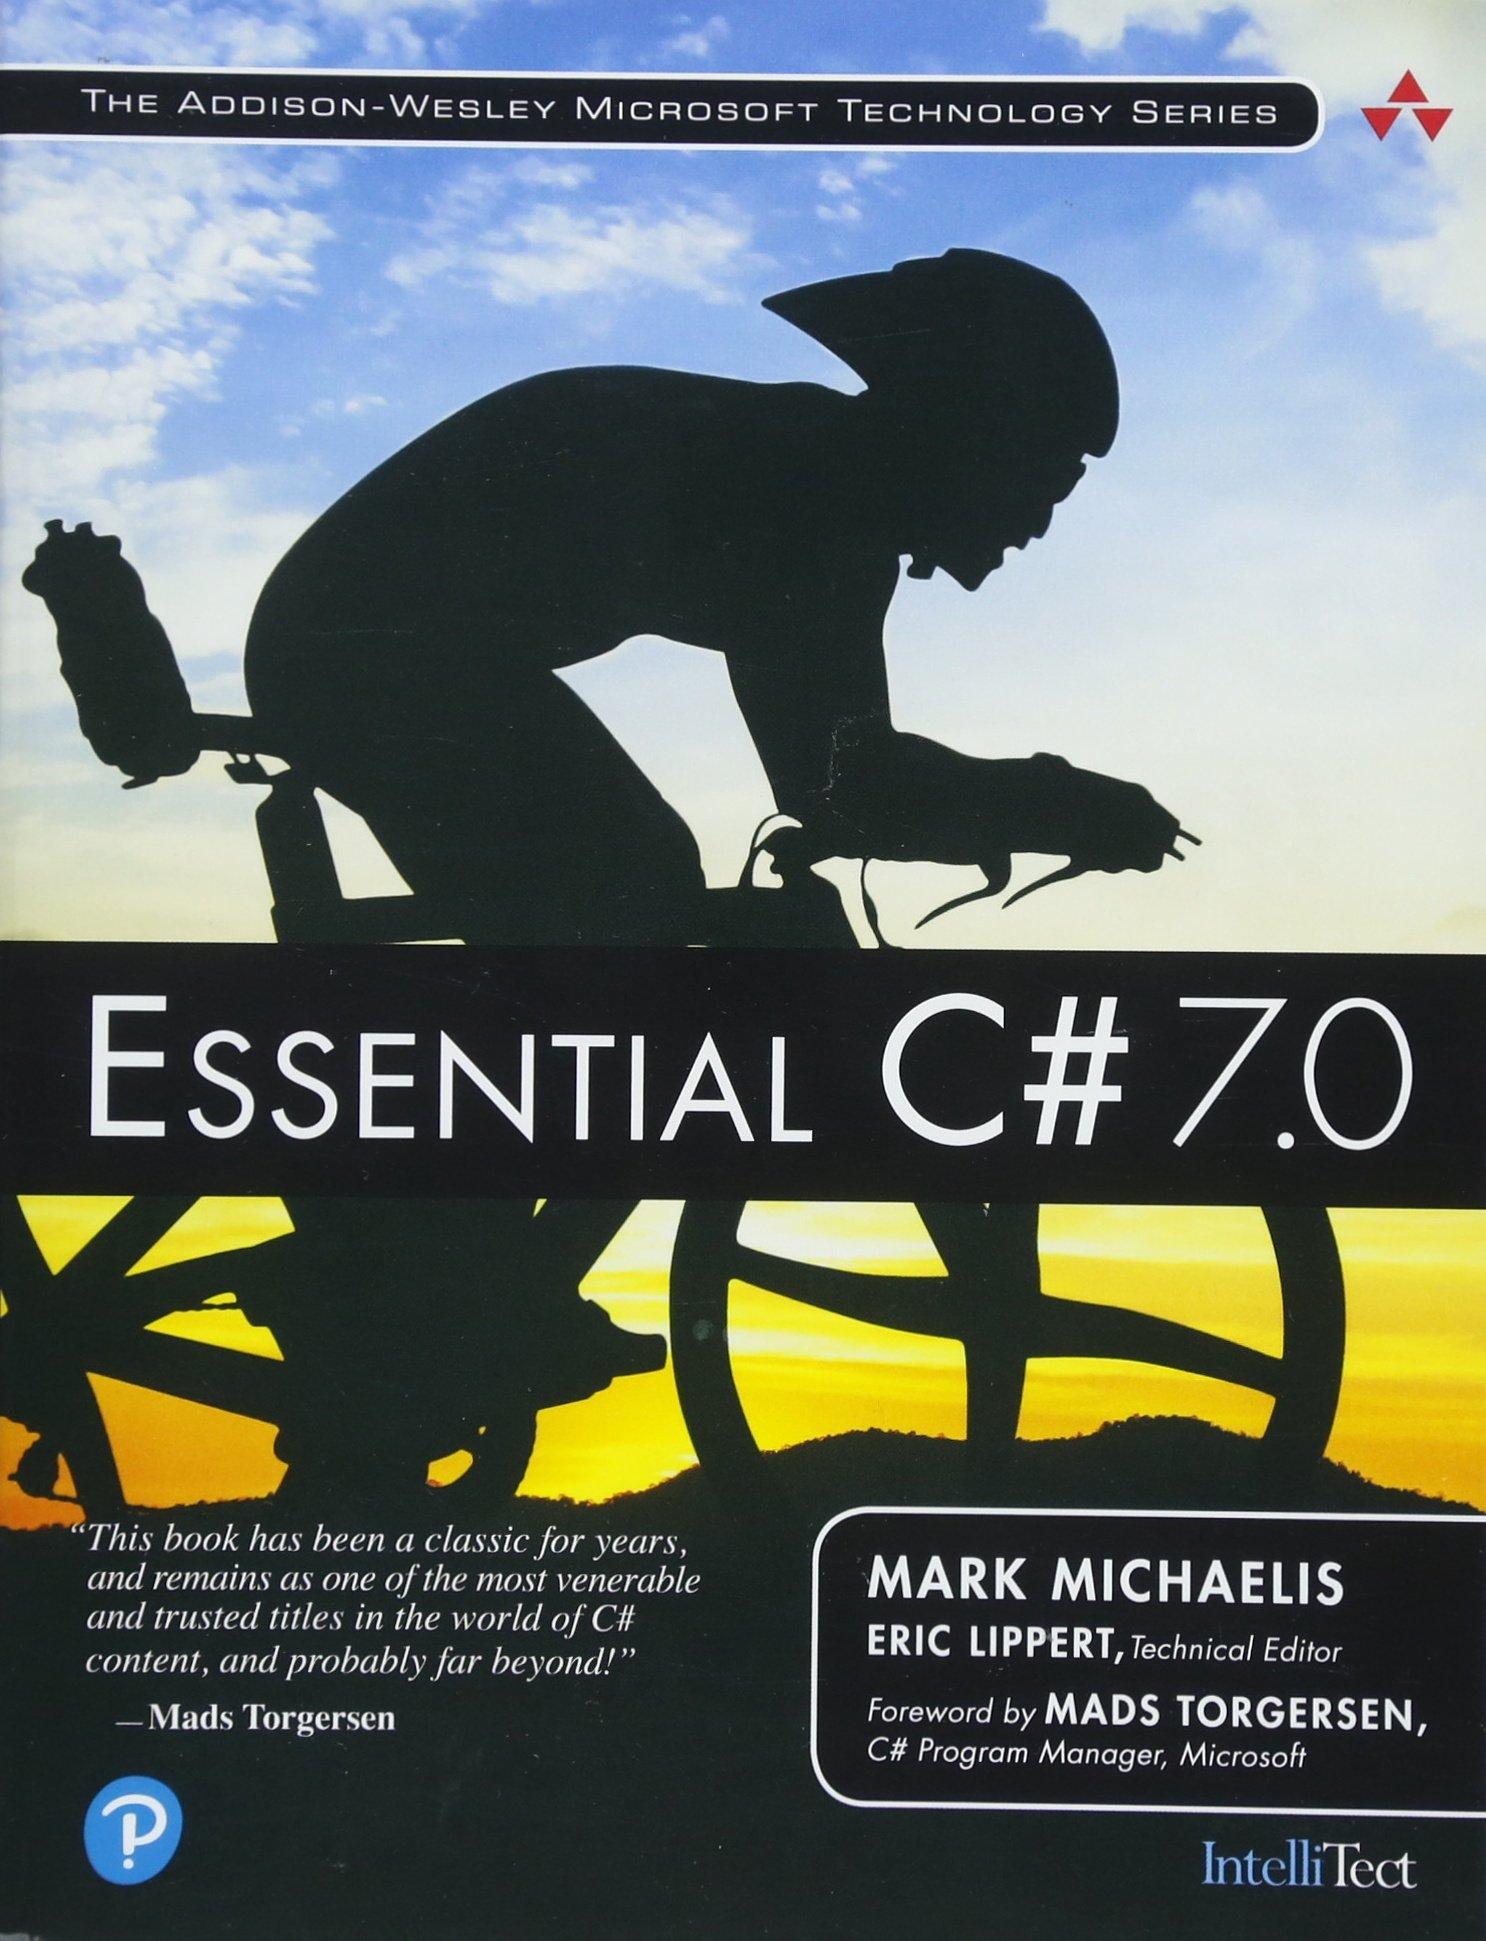 Essential C# 7.0 Addison-Wesley Microsoft Technology: Amazon.de ...